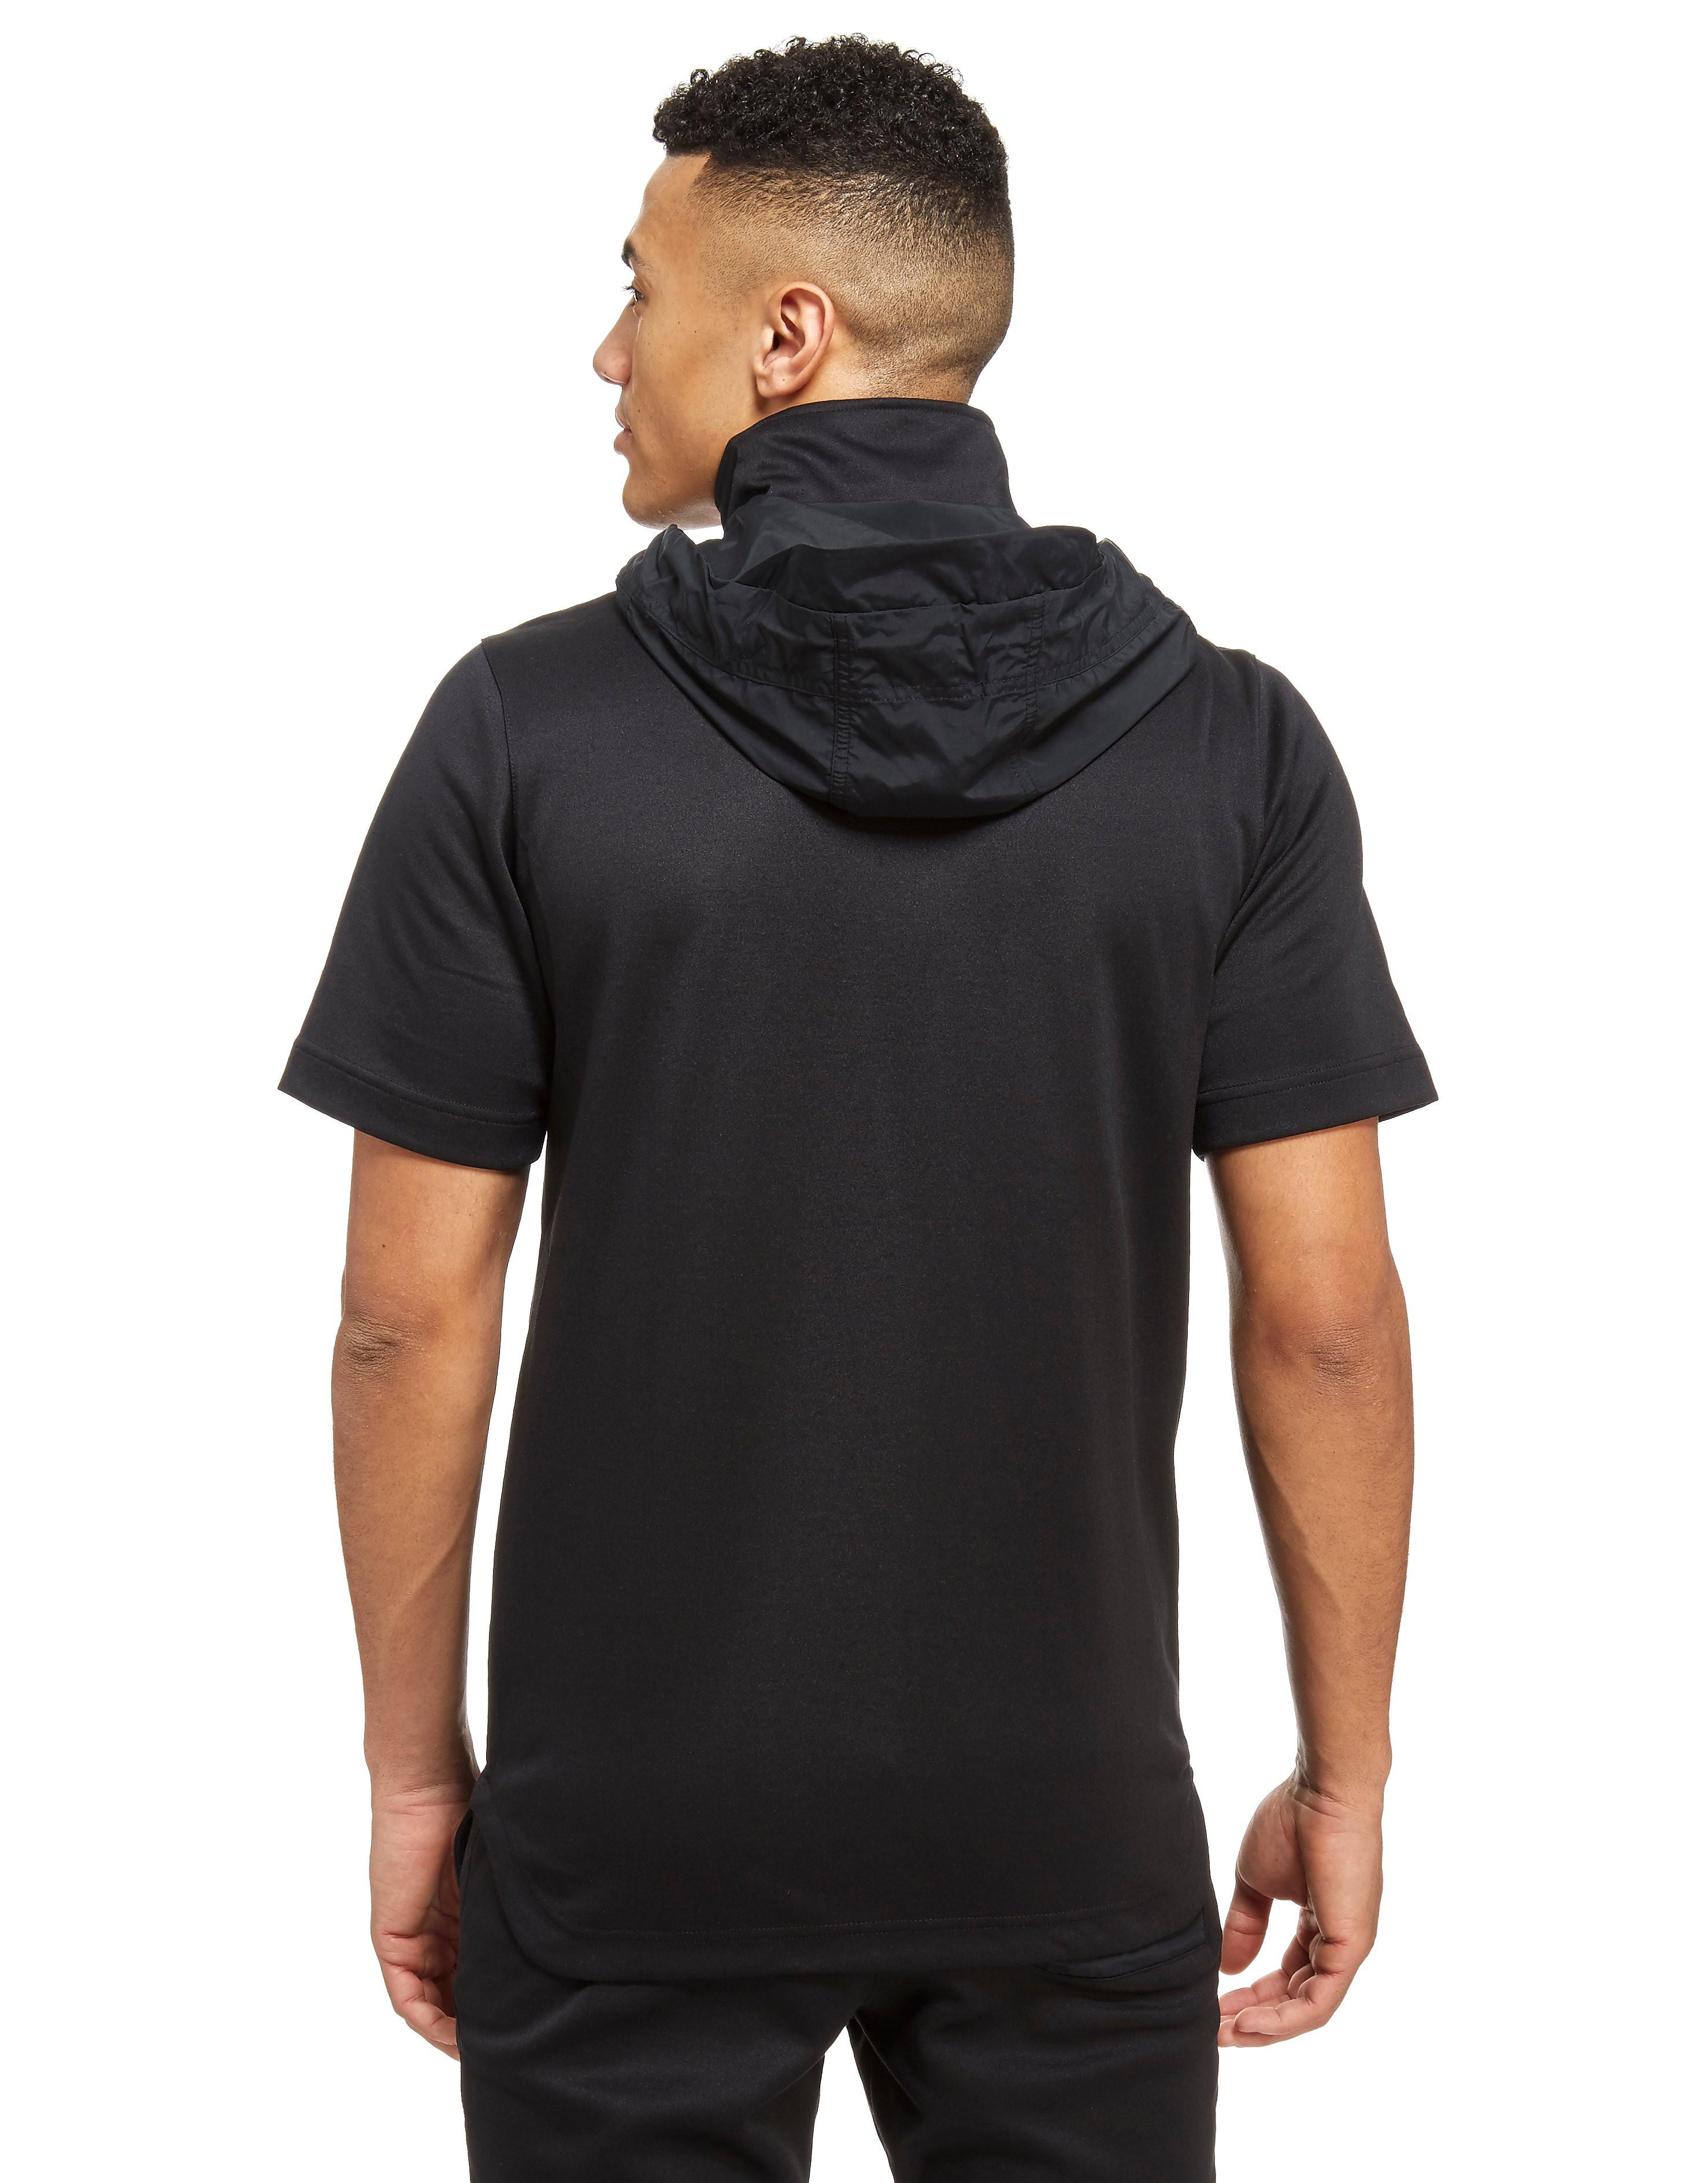 Nike Air Max Short Sleeve Hoody